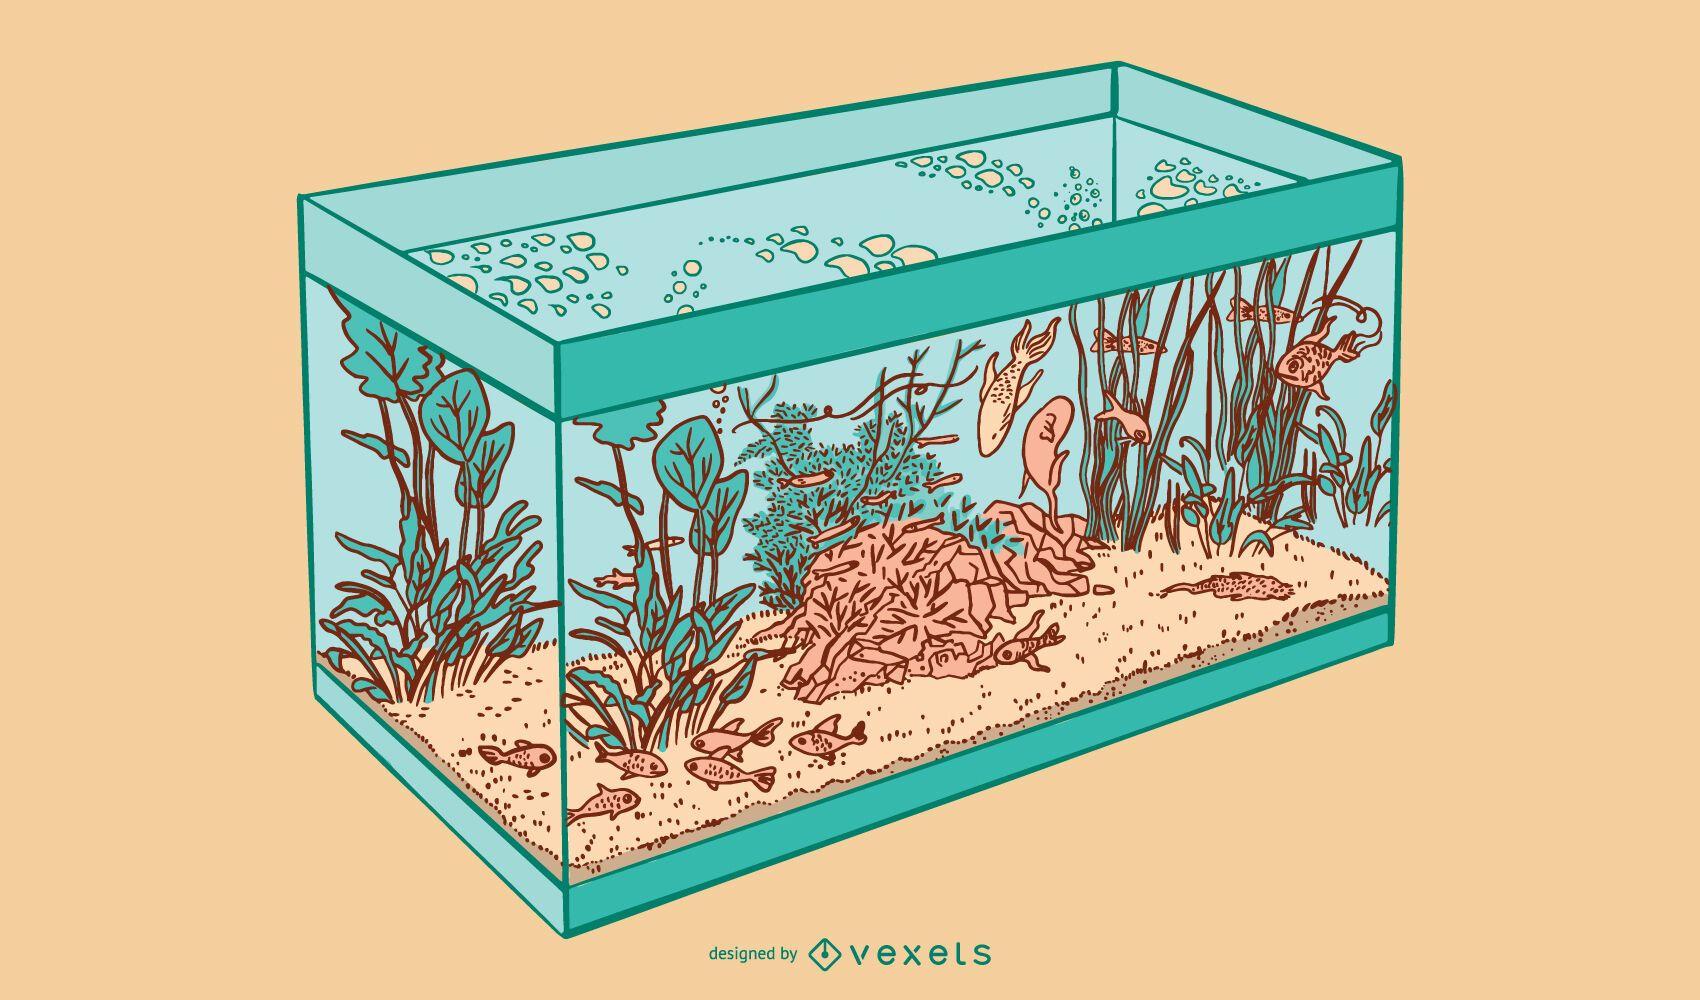 Square fishbowl illustration